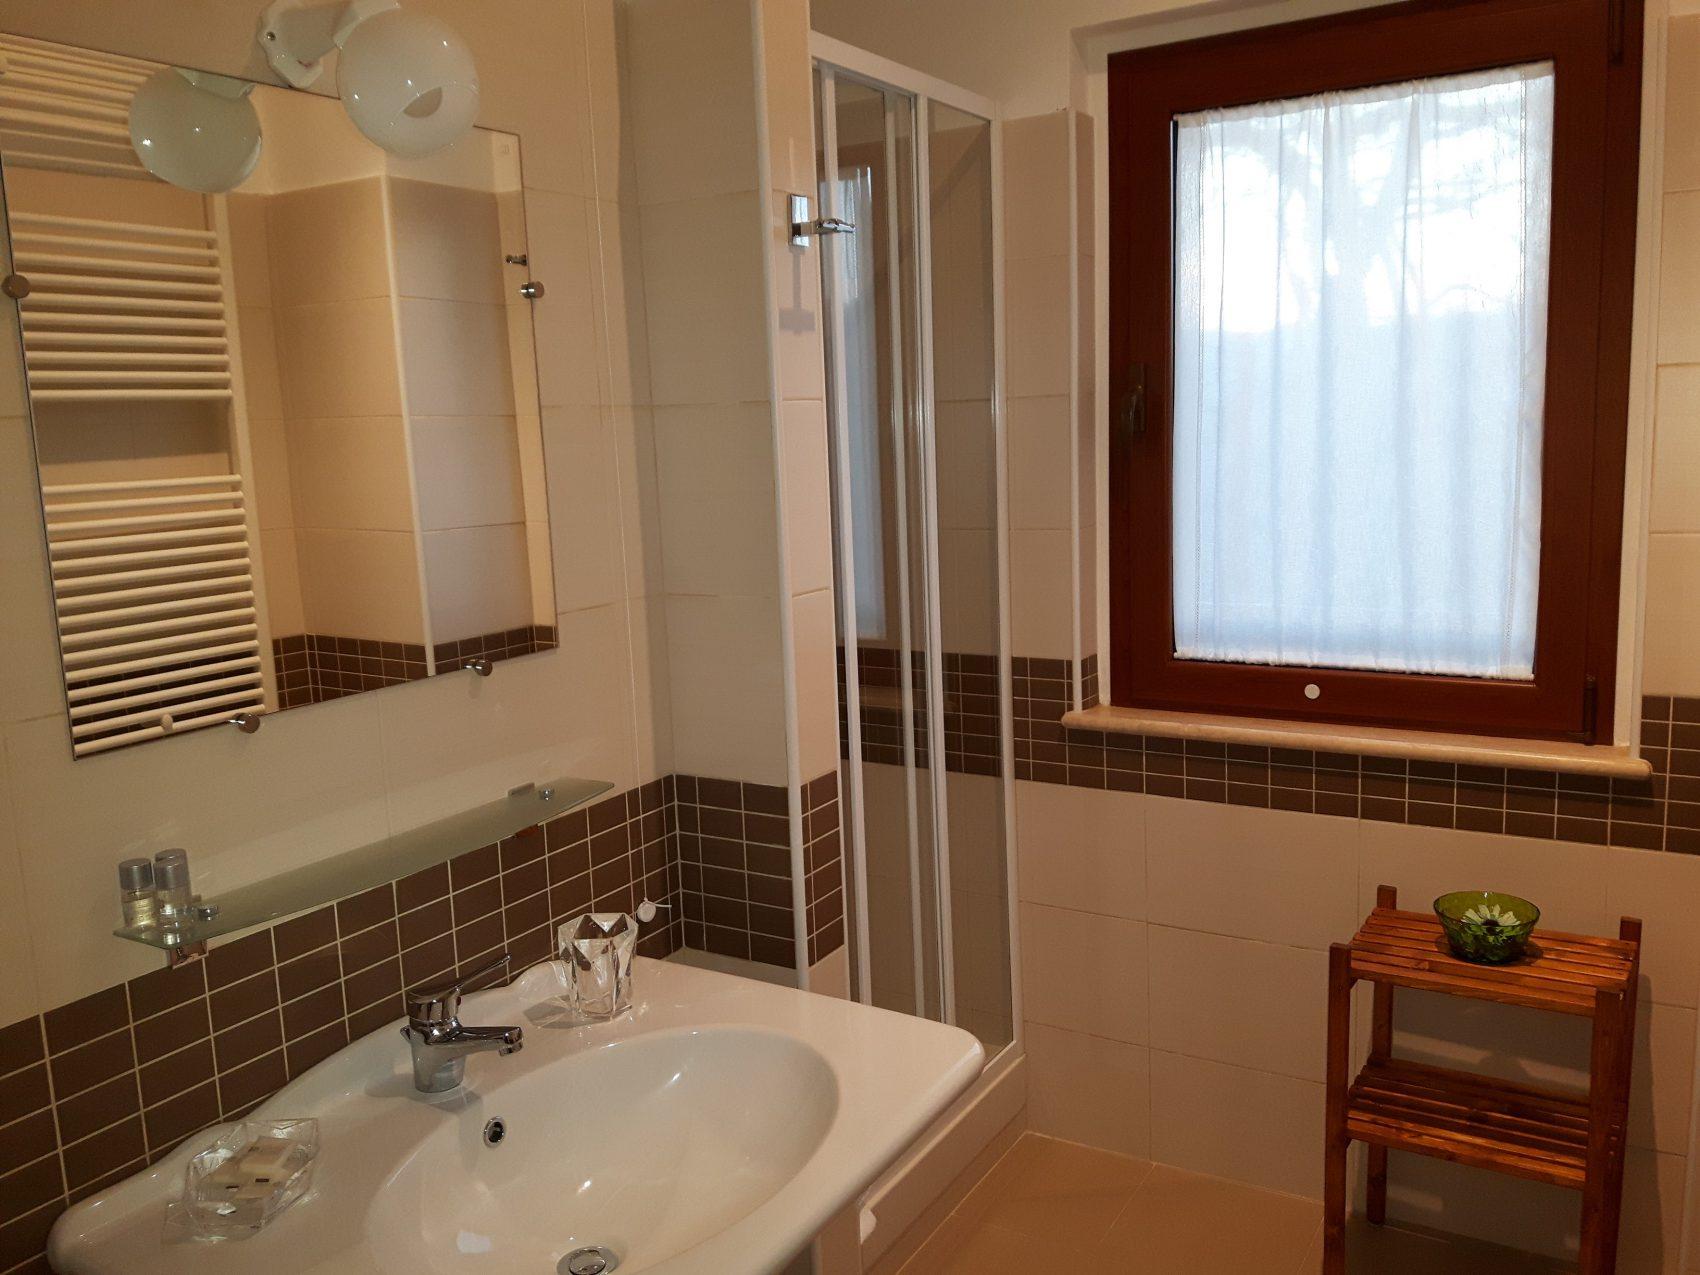 Bagno Casa Di Campagna : Bagno suite la casa in campagna bed and breakfast